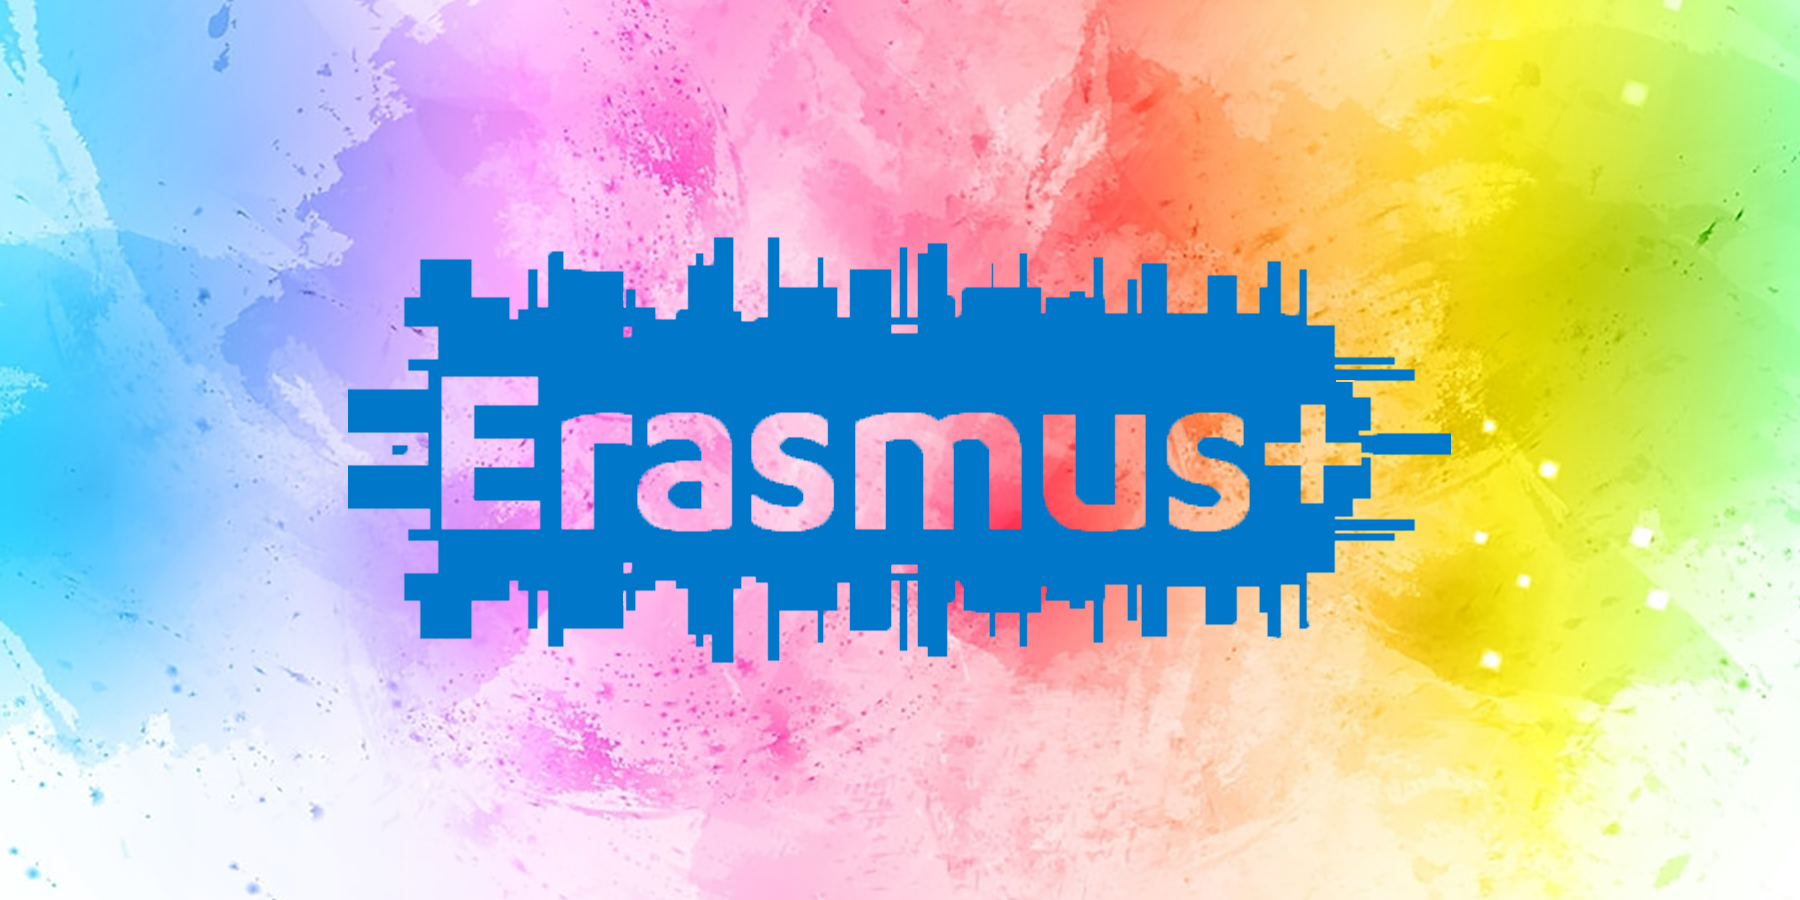 Objavljen novi Erasmus+ natječaj za studente